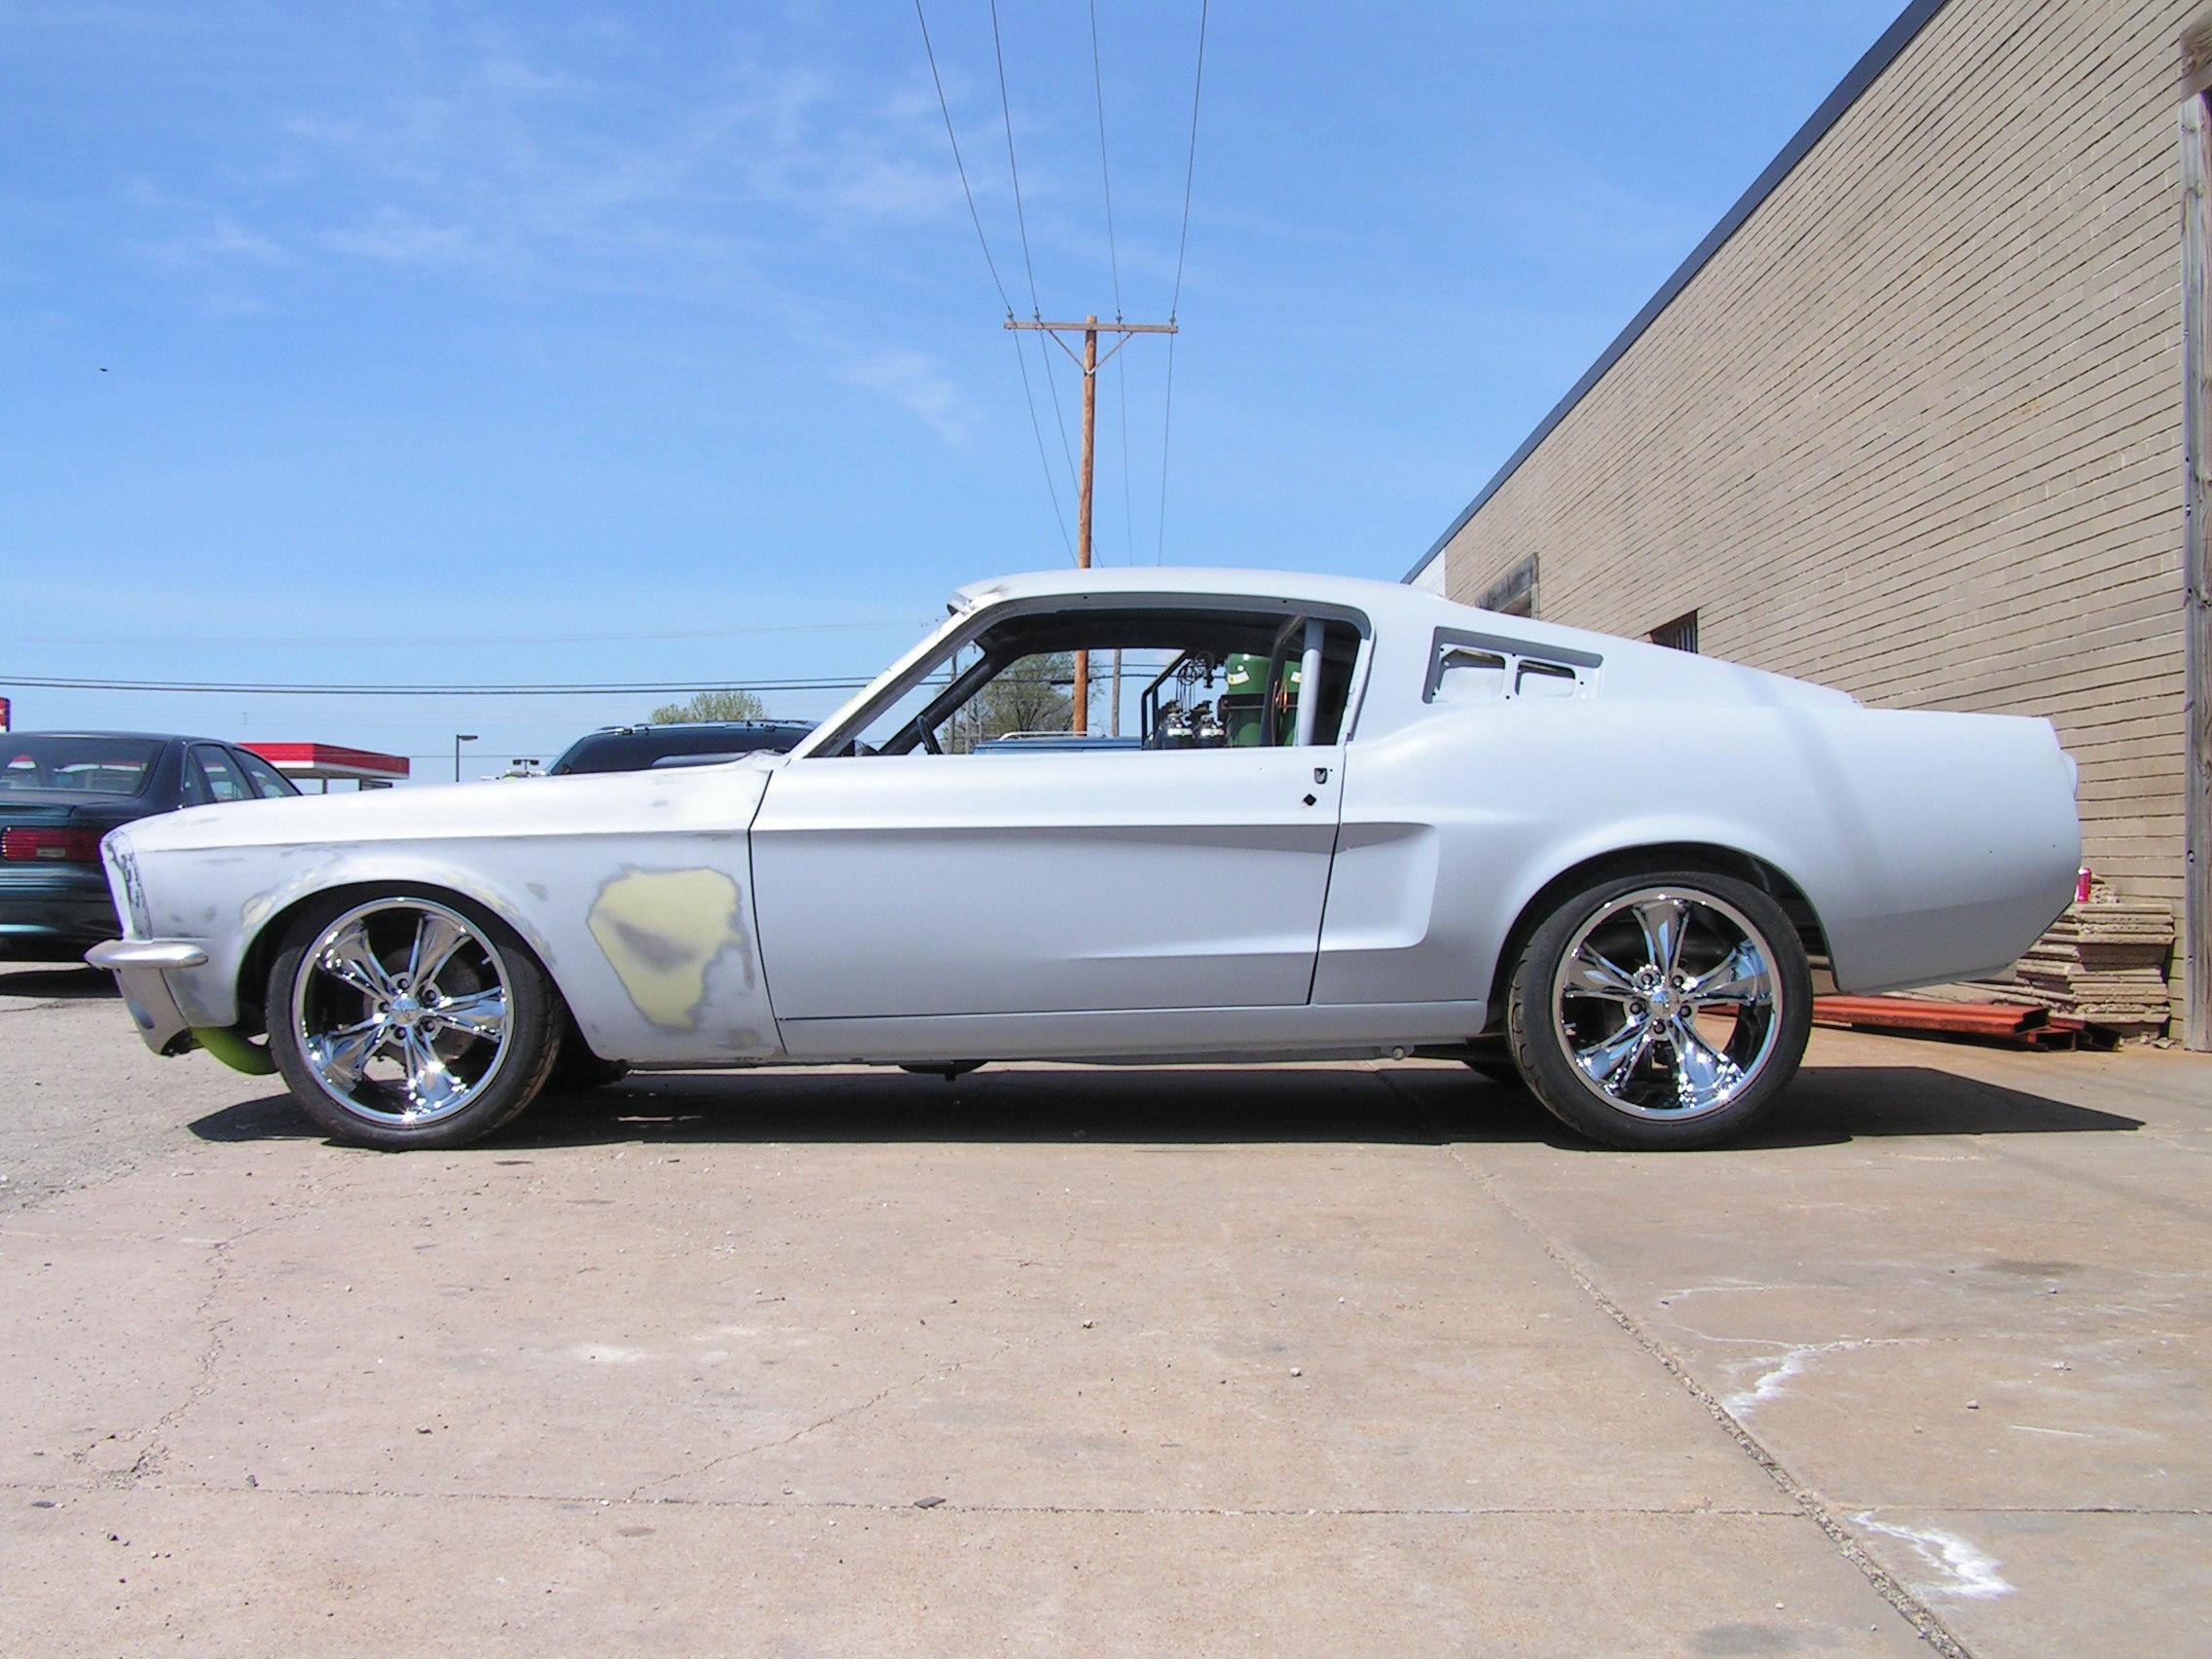 Custom 68 Mustang Www Pixshark Com Images Galleries